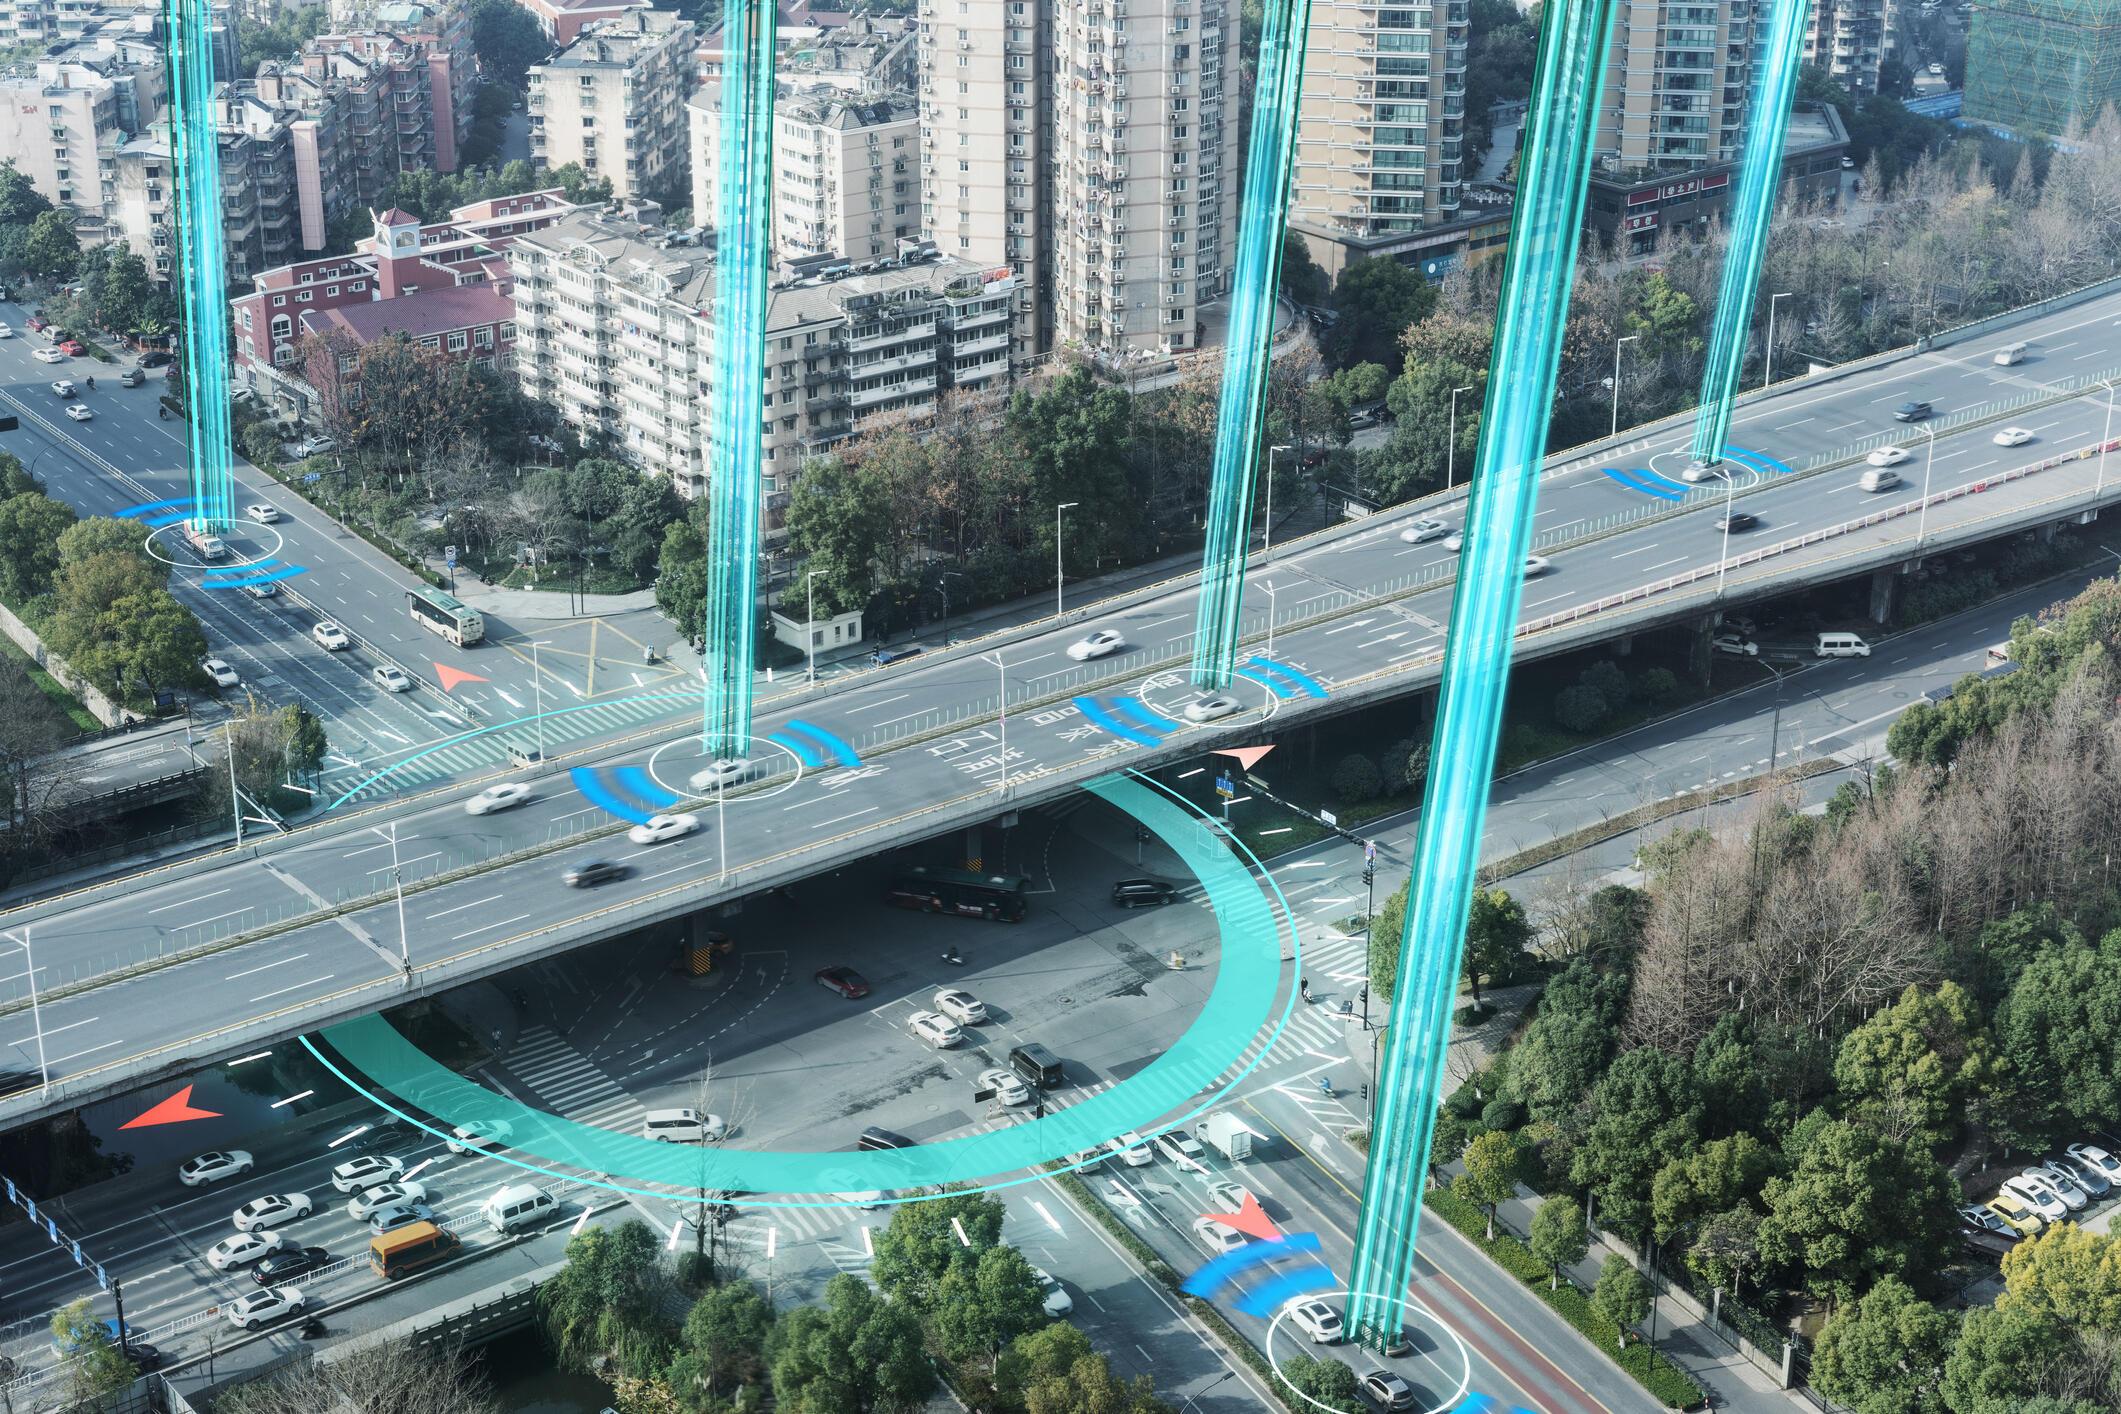 Ville virtuelle - environnement - vie - citoyens - GettyImages-1210800392